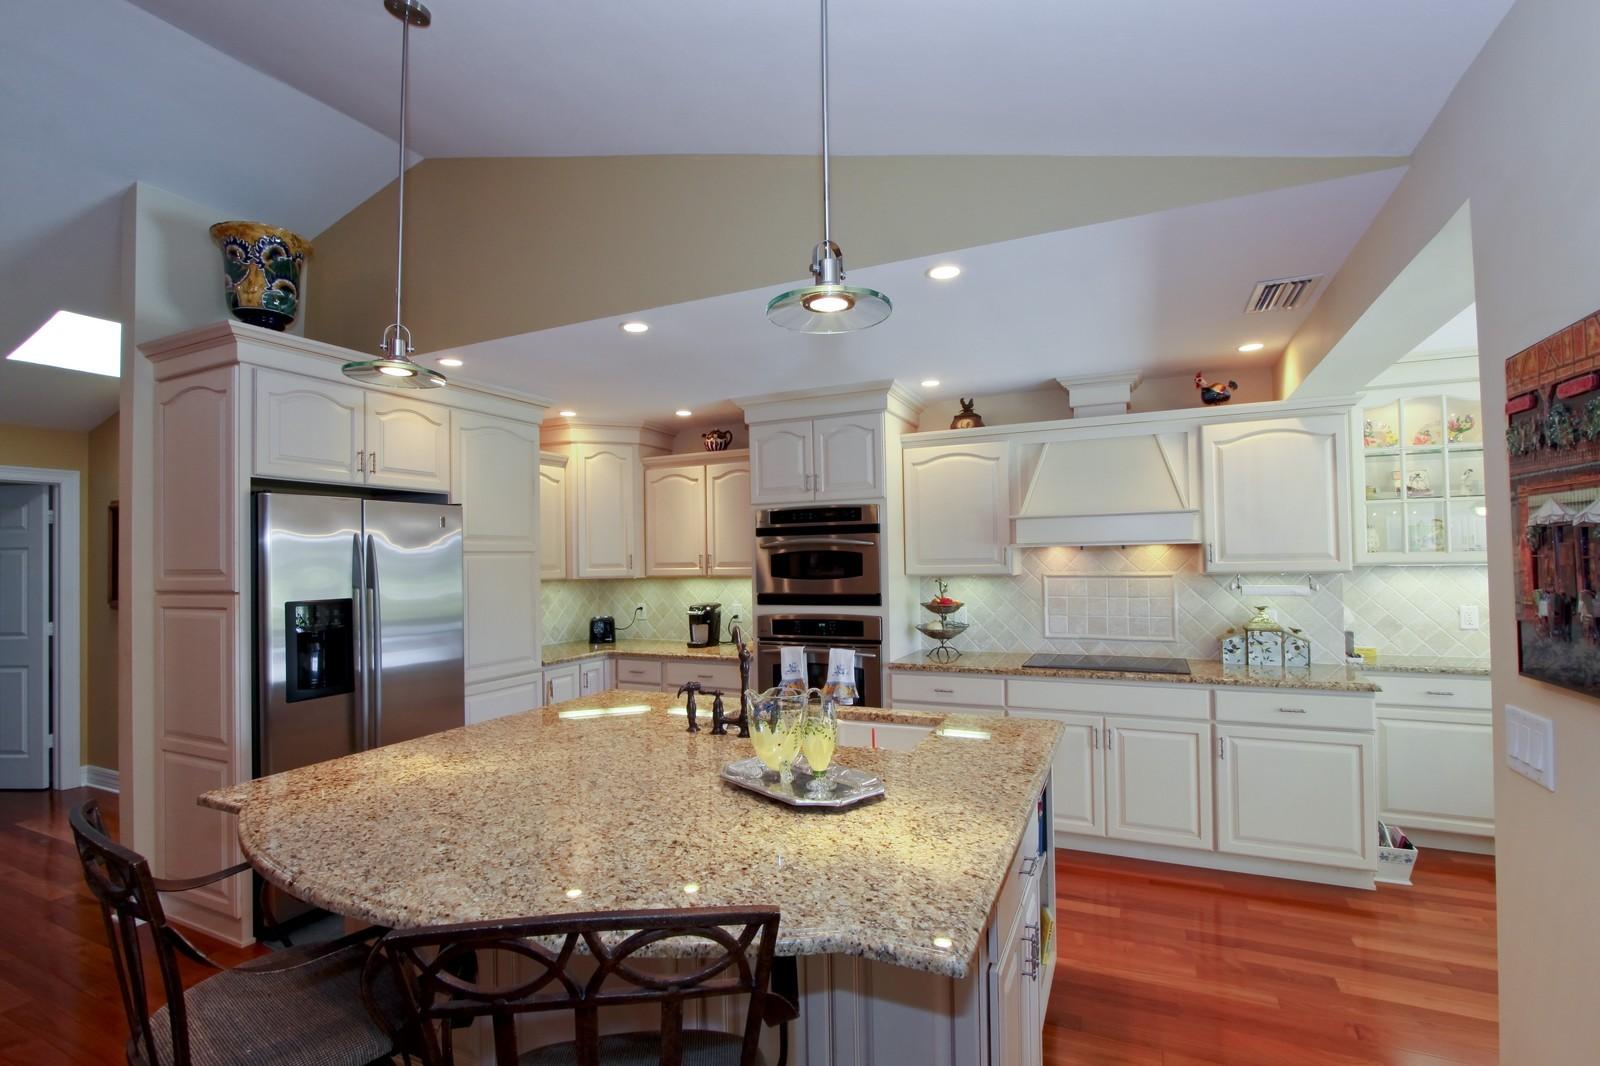 Real Estate Photography - 1986 Imperial GC Blvd, Naples, FL, 34110 - Kitchen